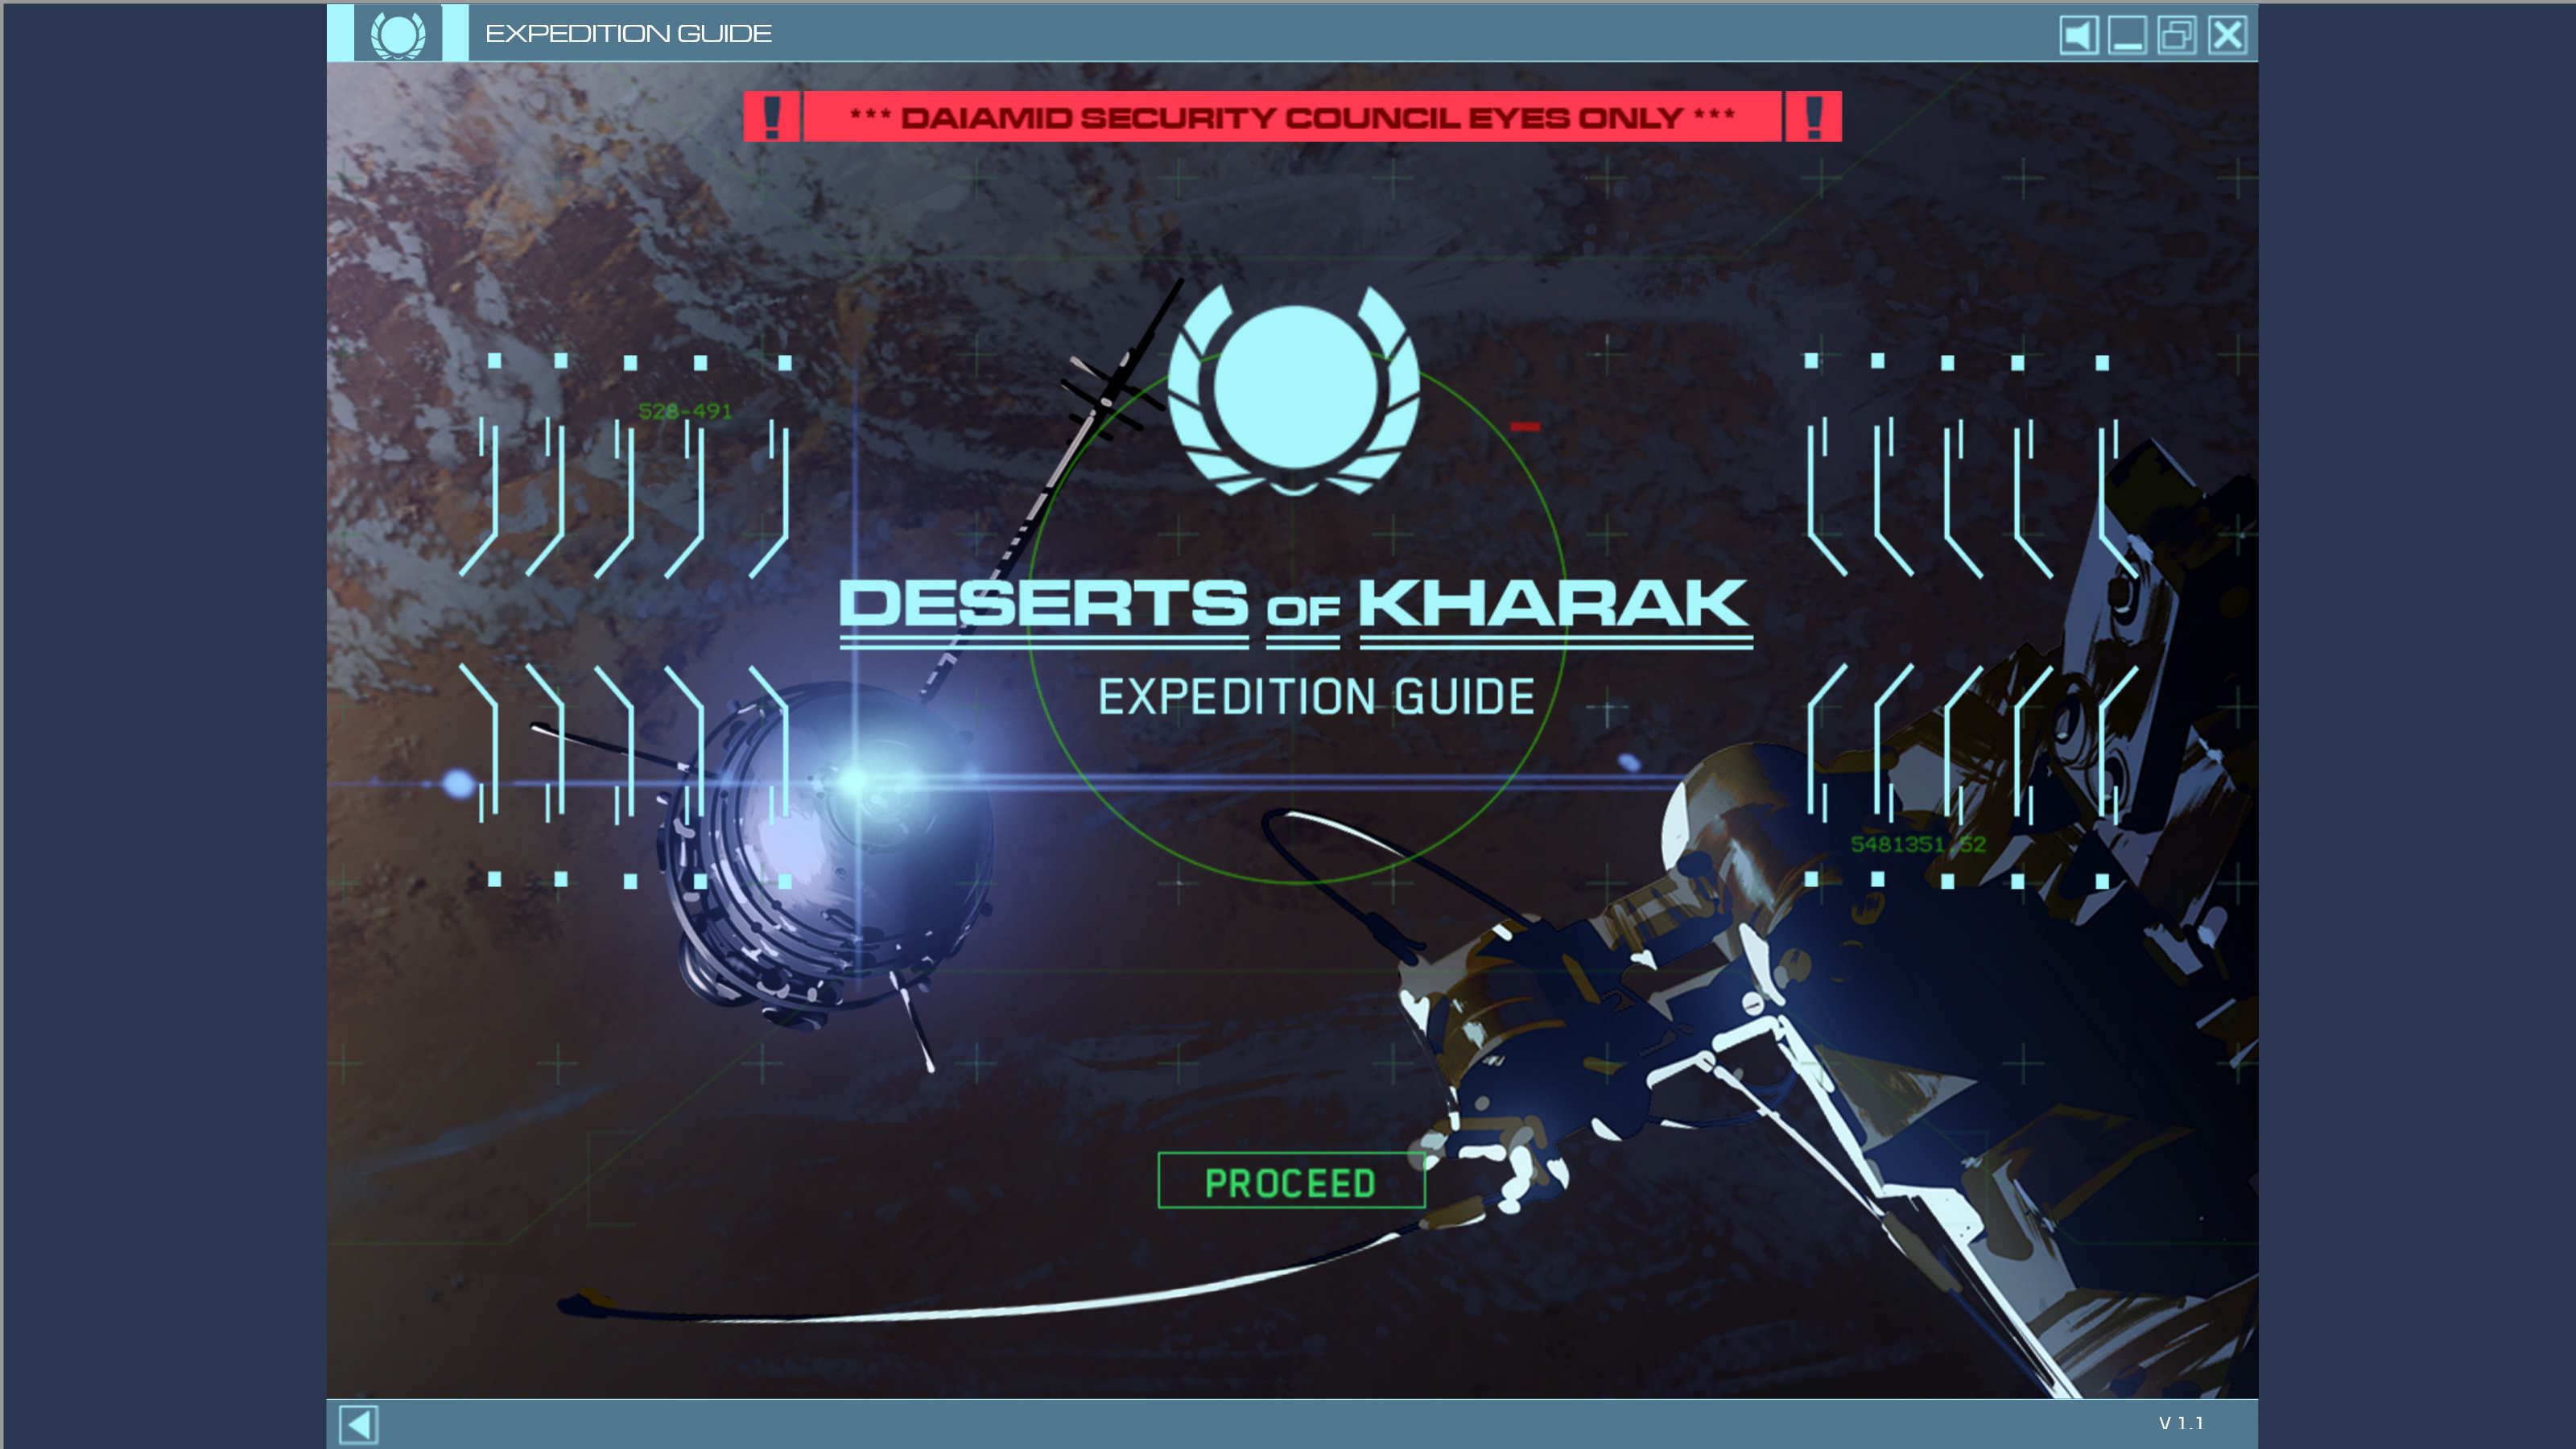 Homeworld Deserts of Kharak Expedition Guide Screenshot 1